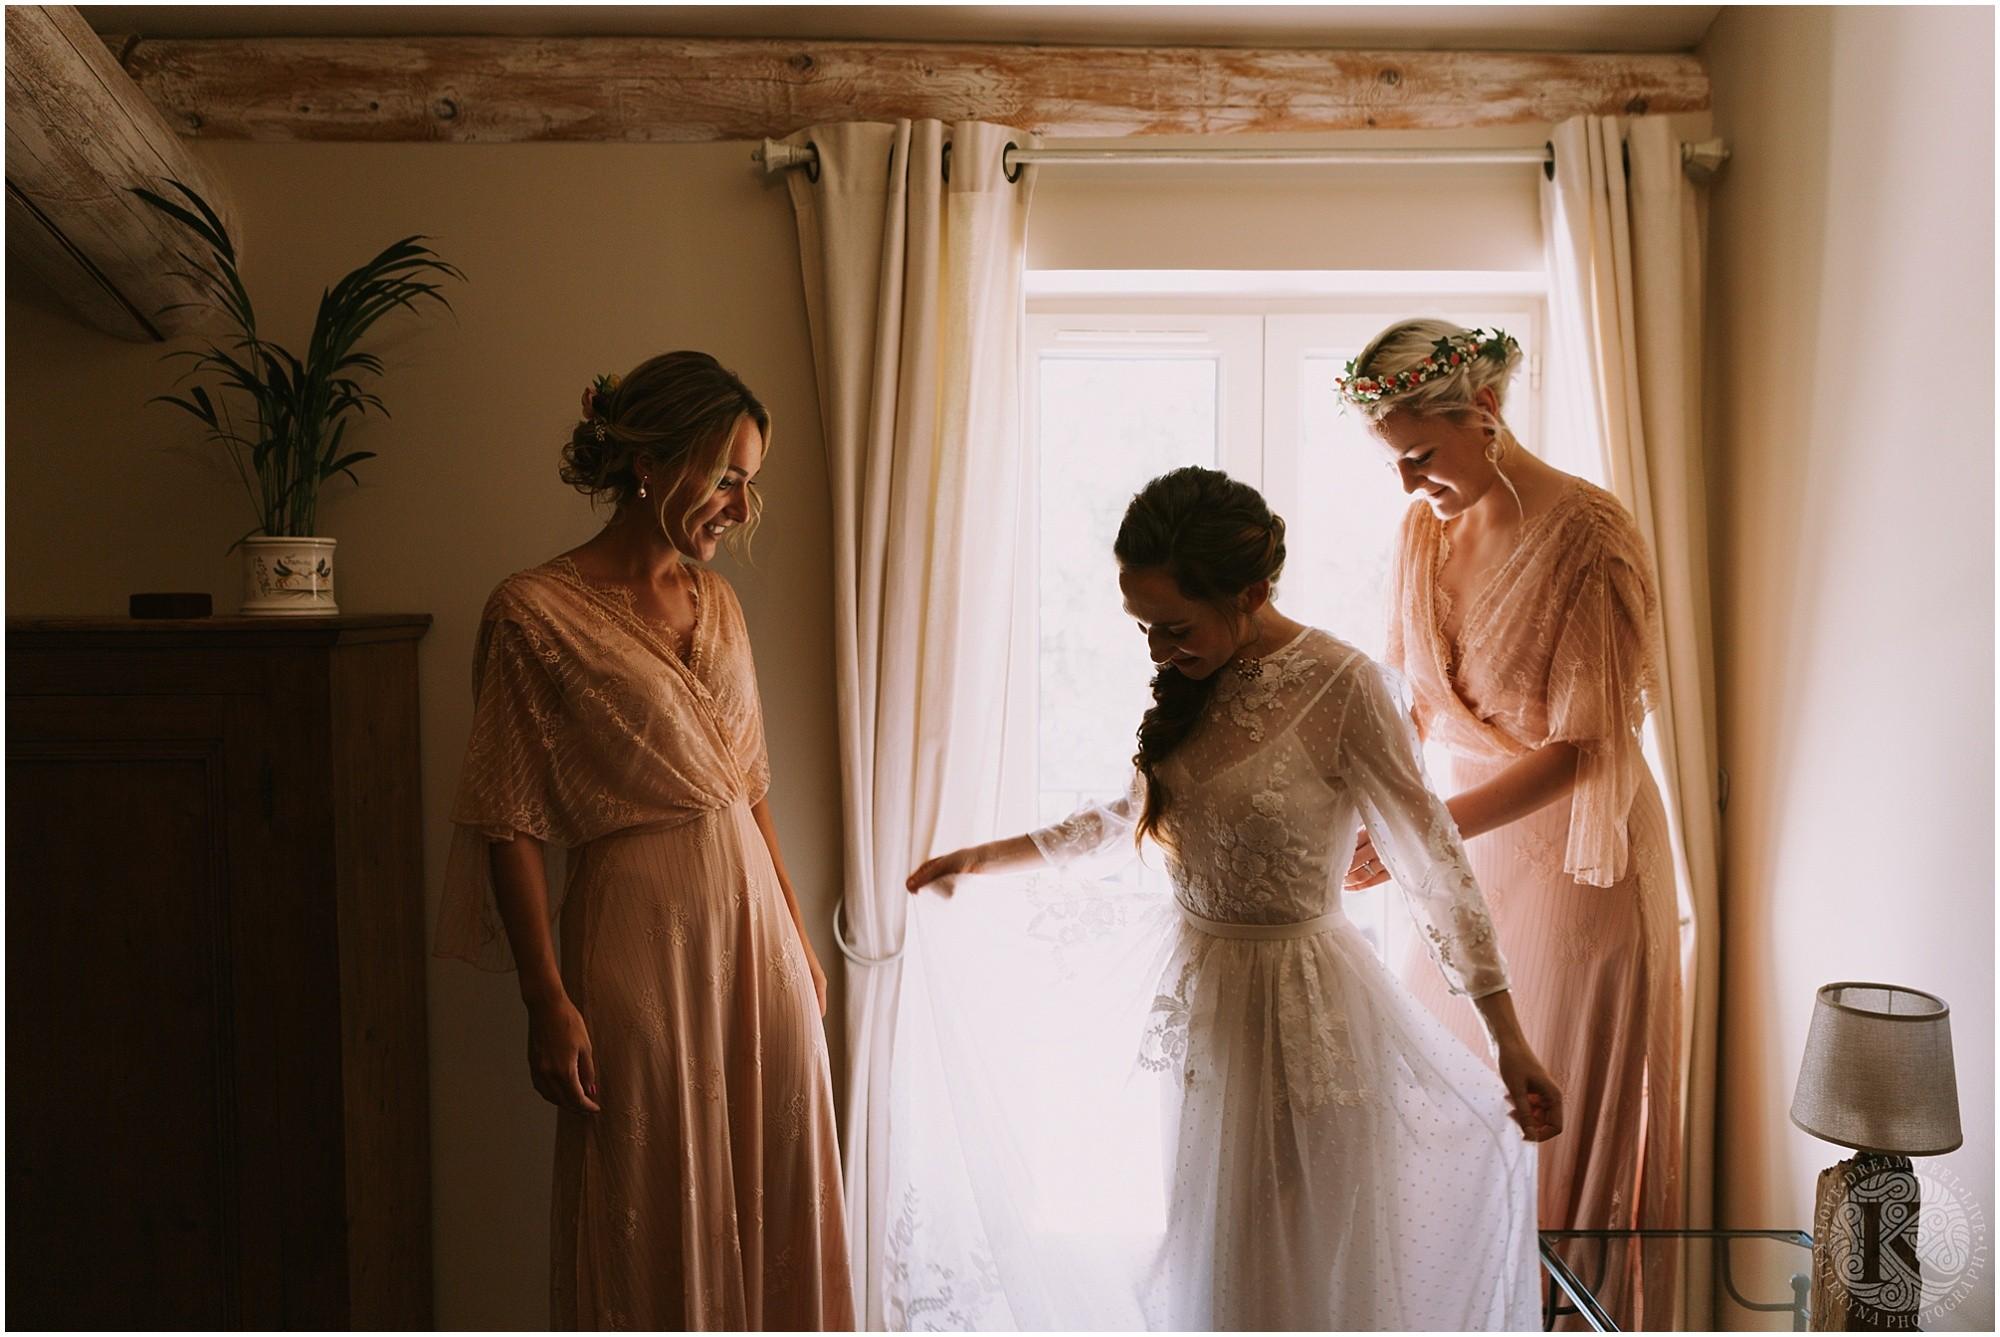 Kateryna-photos-photographe-mariage-vaucluse-provence-avignon-ferme-st-hugues_0020.jpg